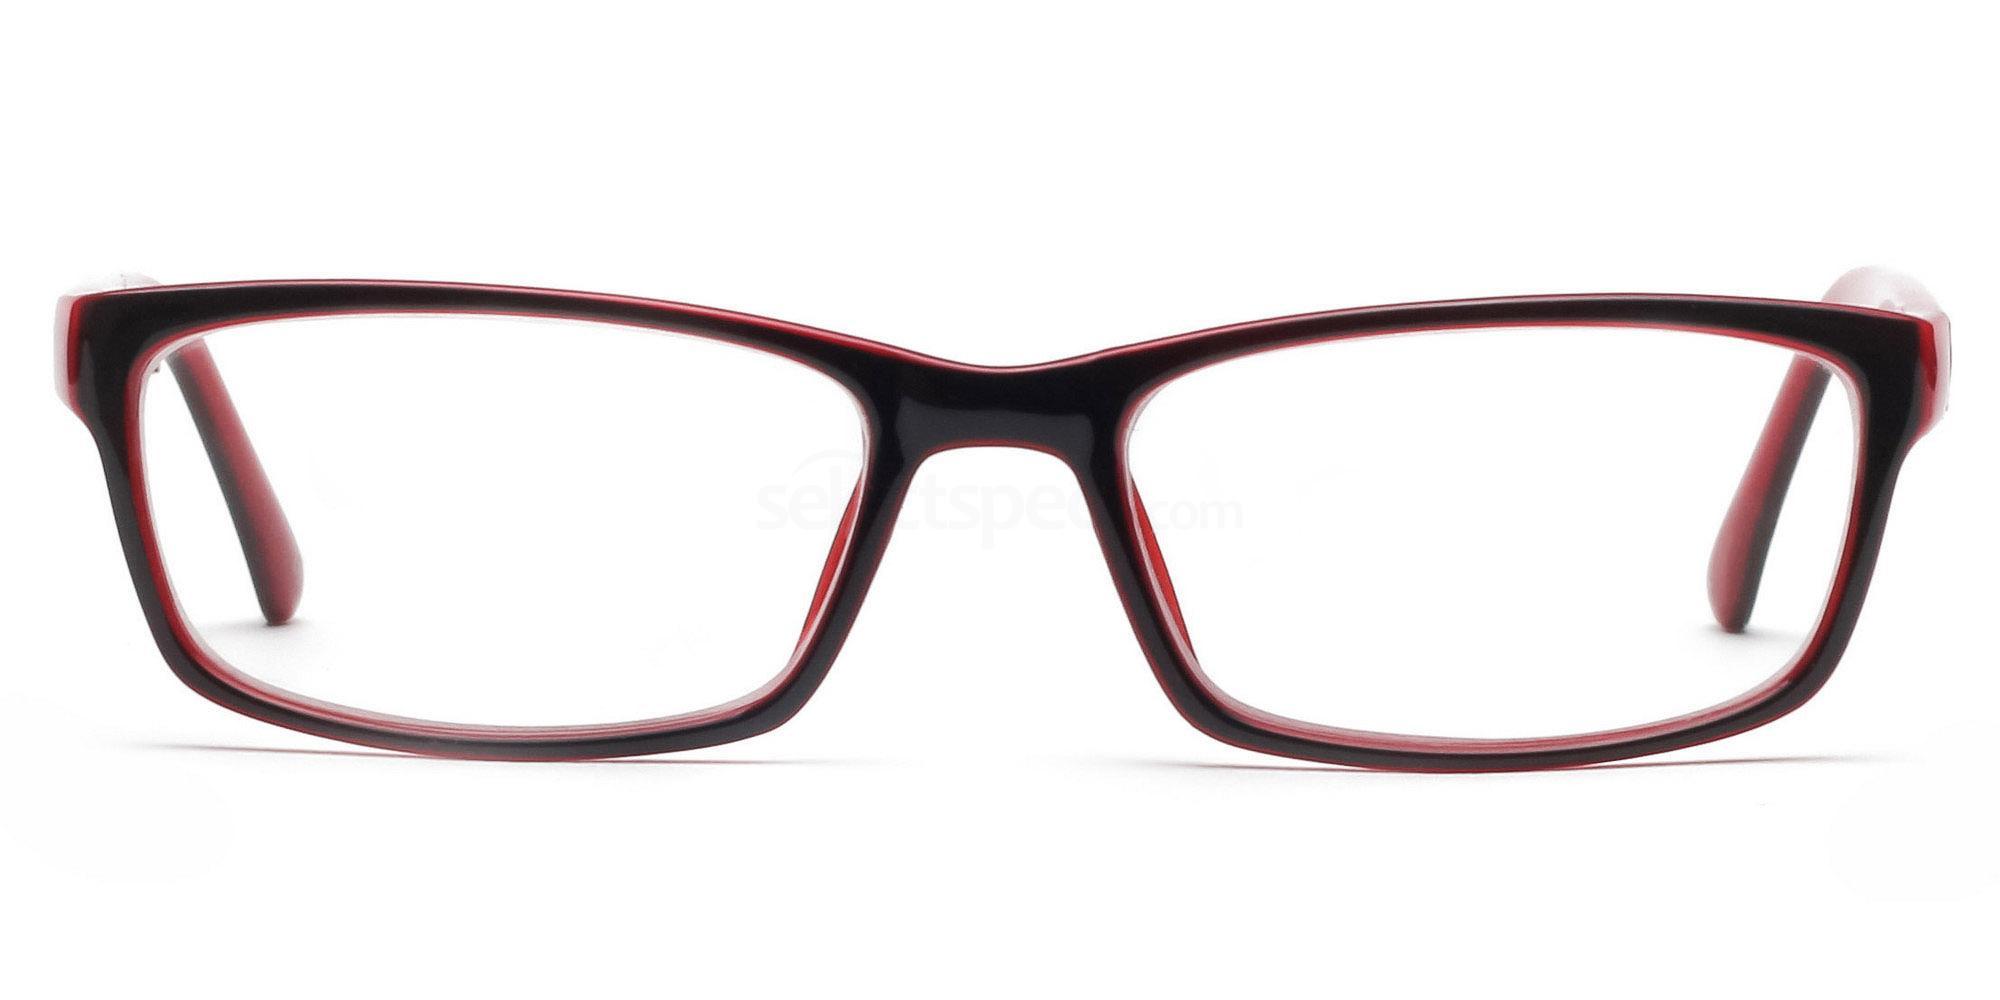 COL.23 2426 - Black and Red Glasses, Savannah